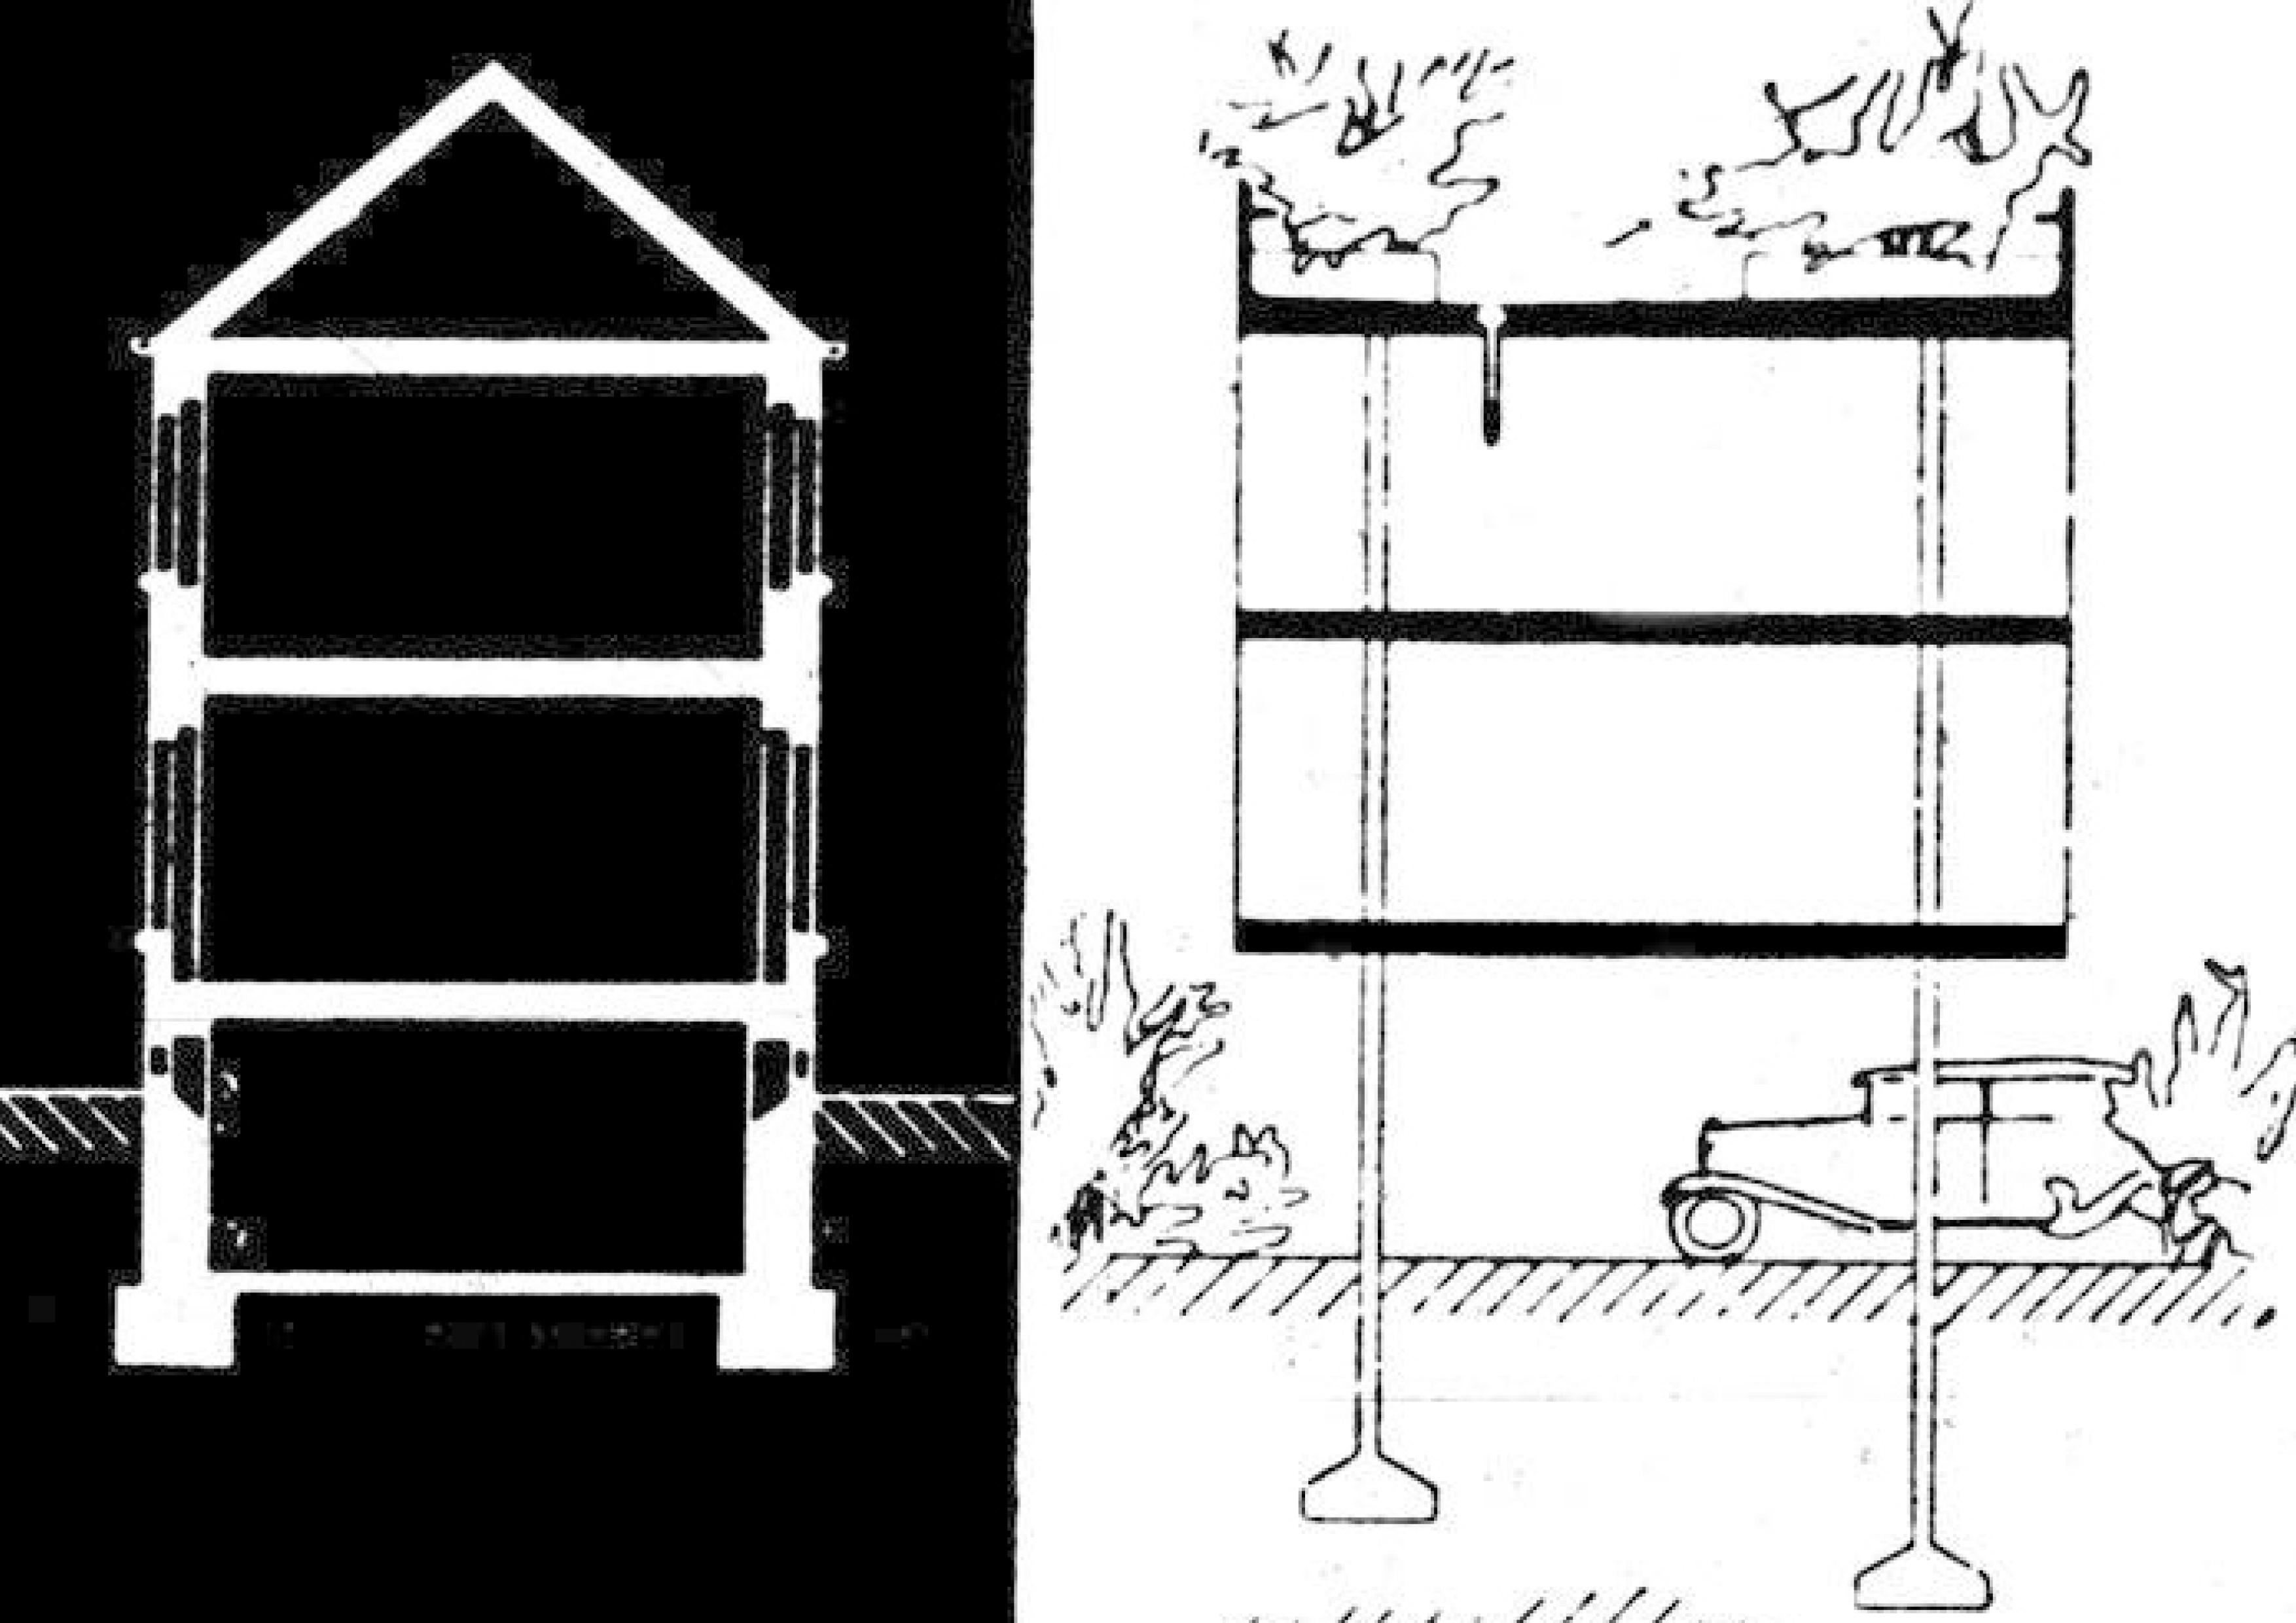 Taller tecnolog a de la arquitectura master for Asignaturas arquitectura